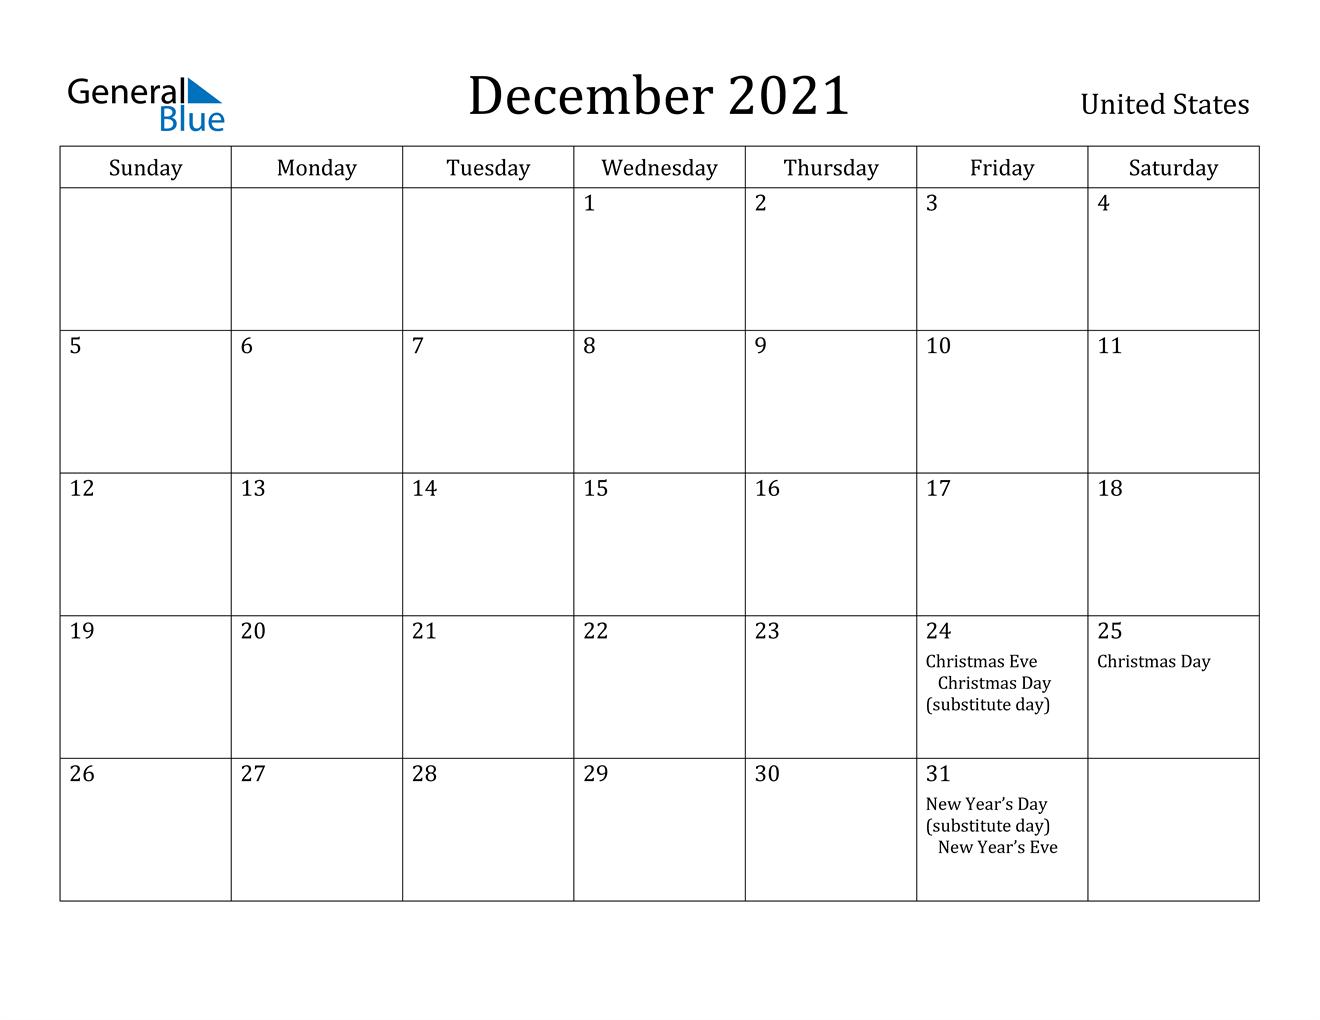 December 2021 Calendar - United States